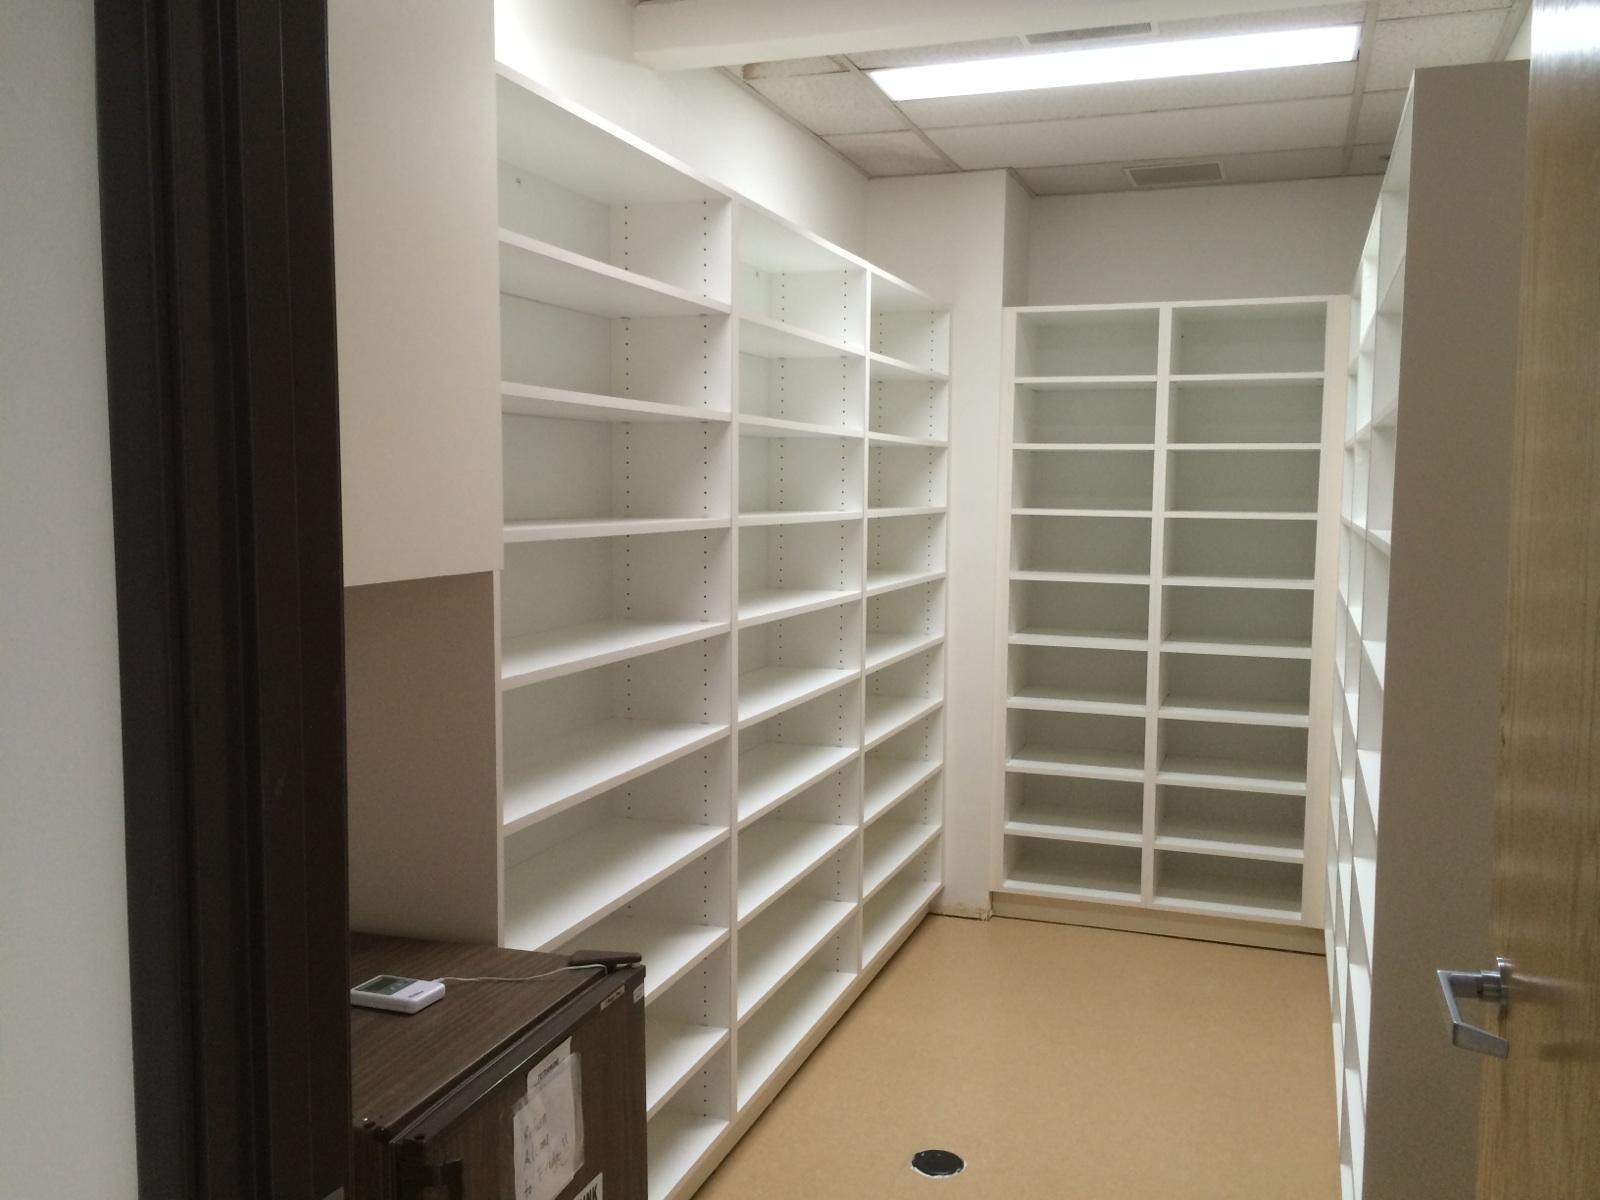 B P Cabinets Riverside CA YP